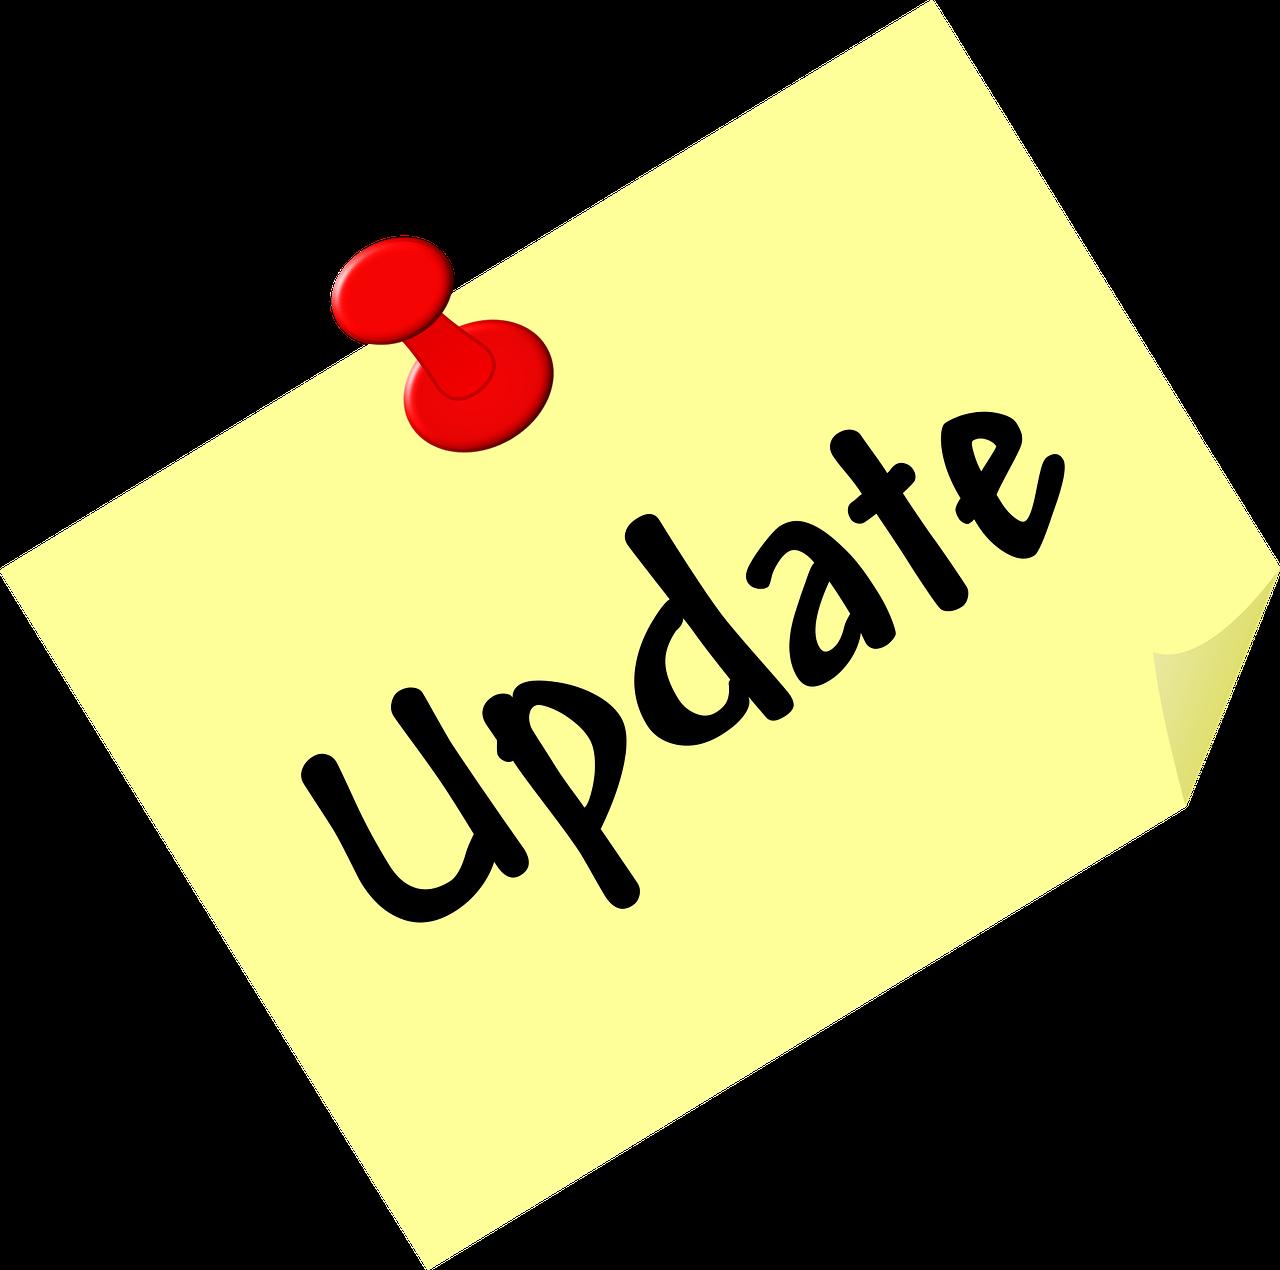 Post it Update Image - New Generation Development